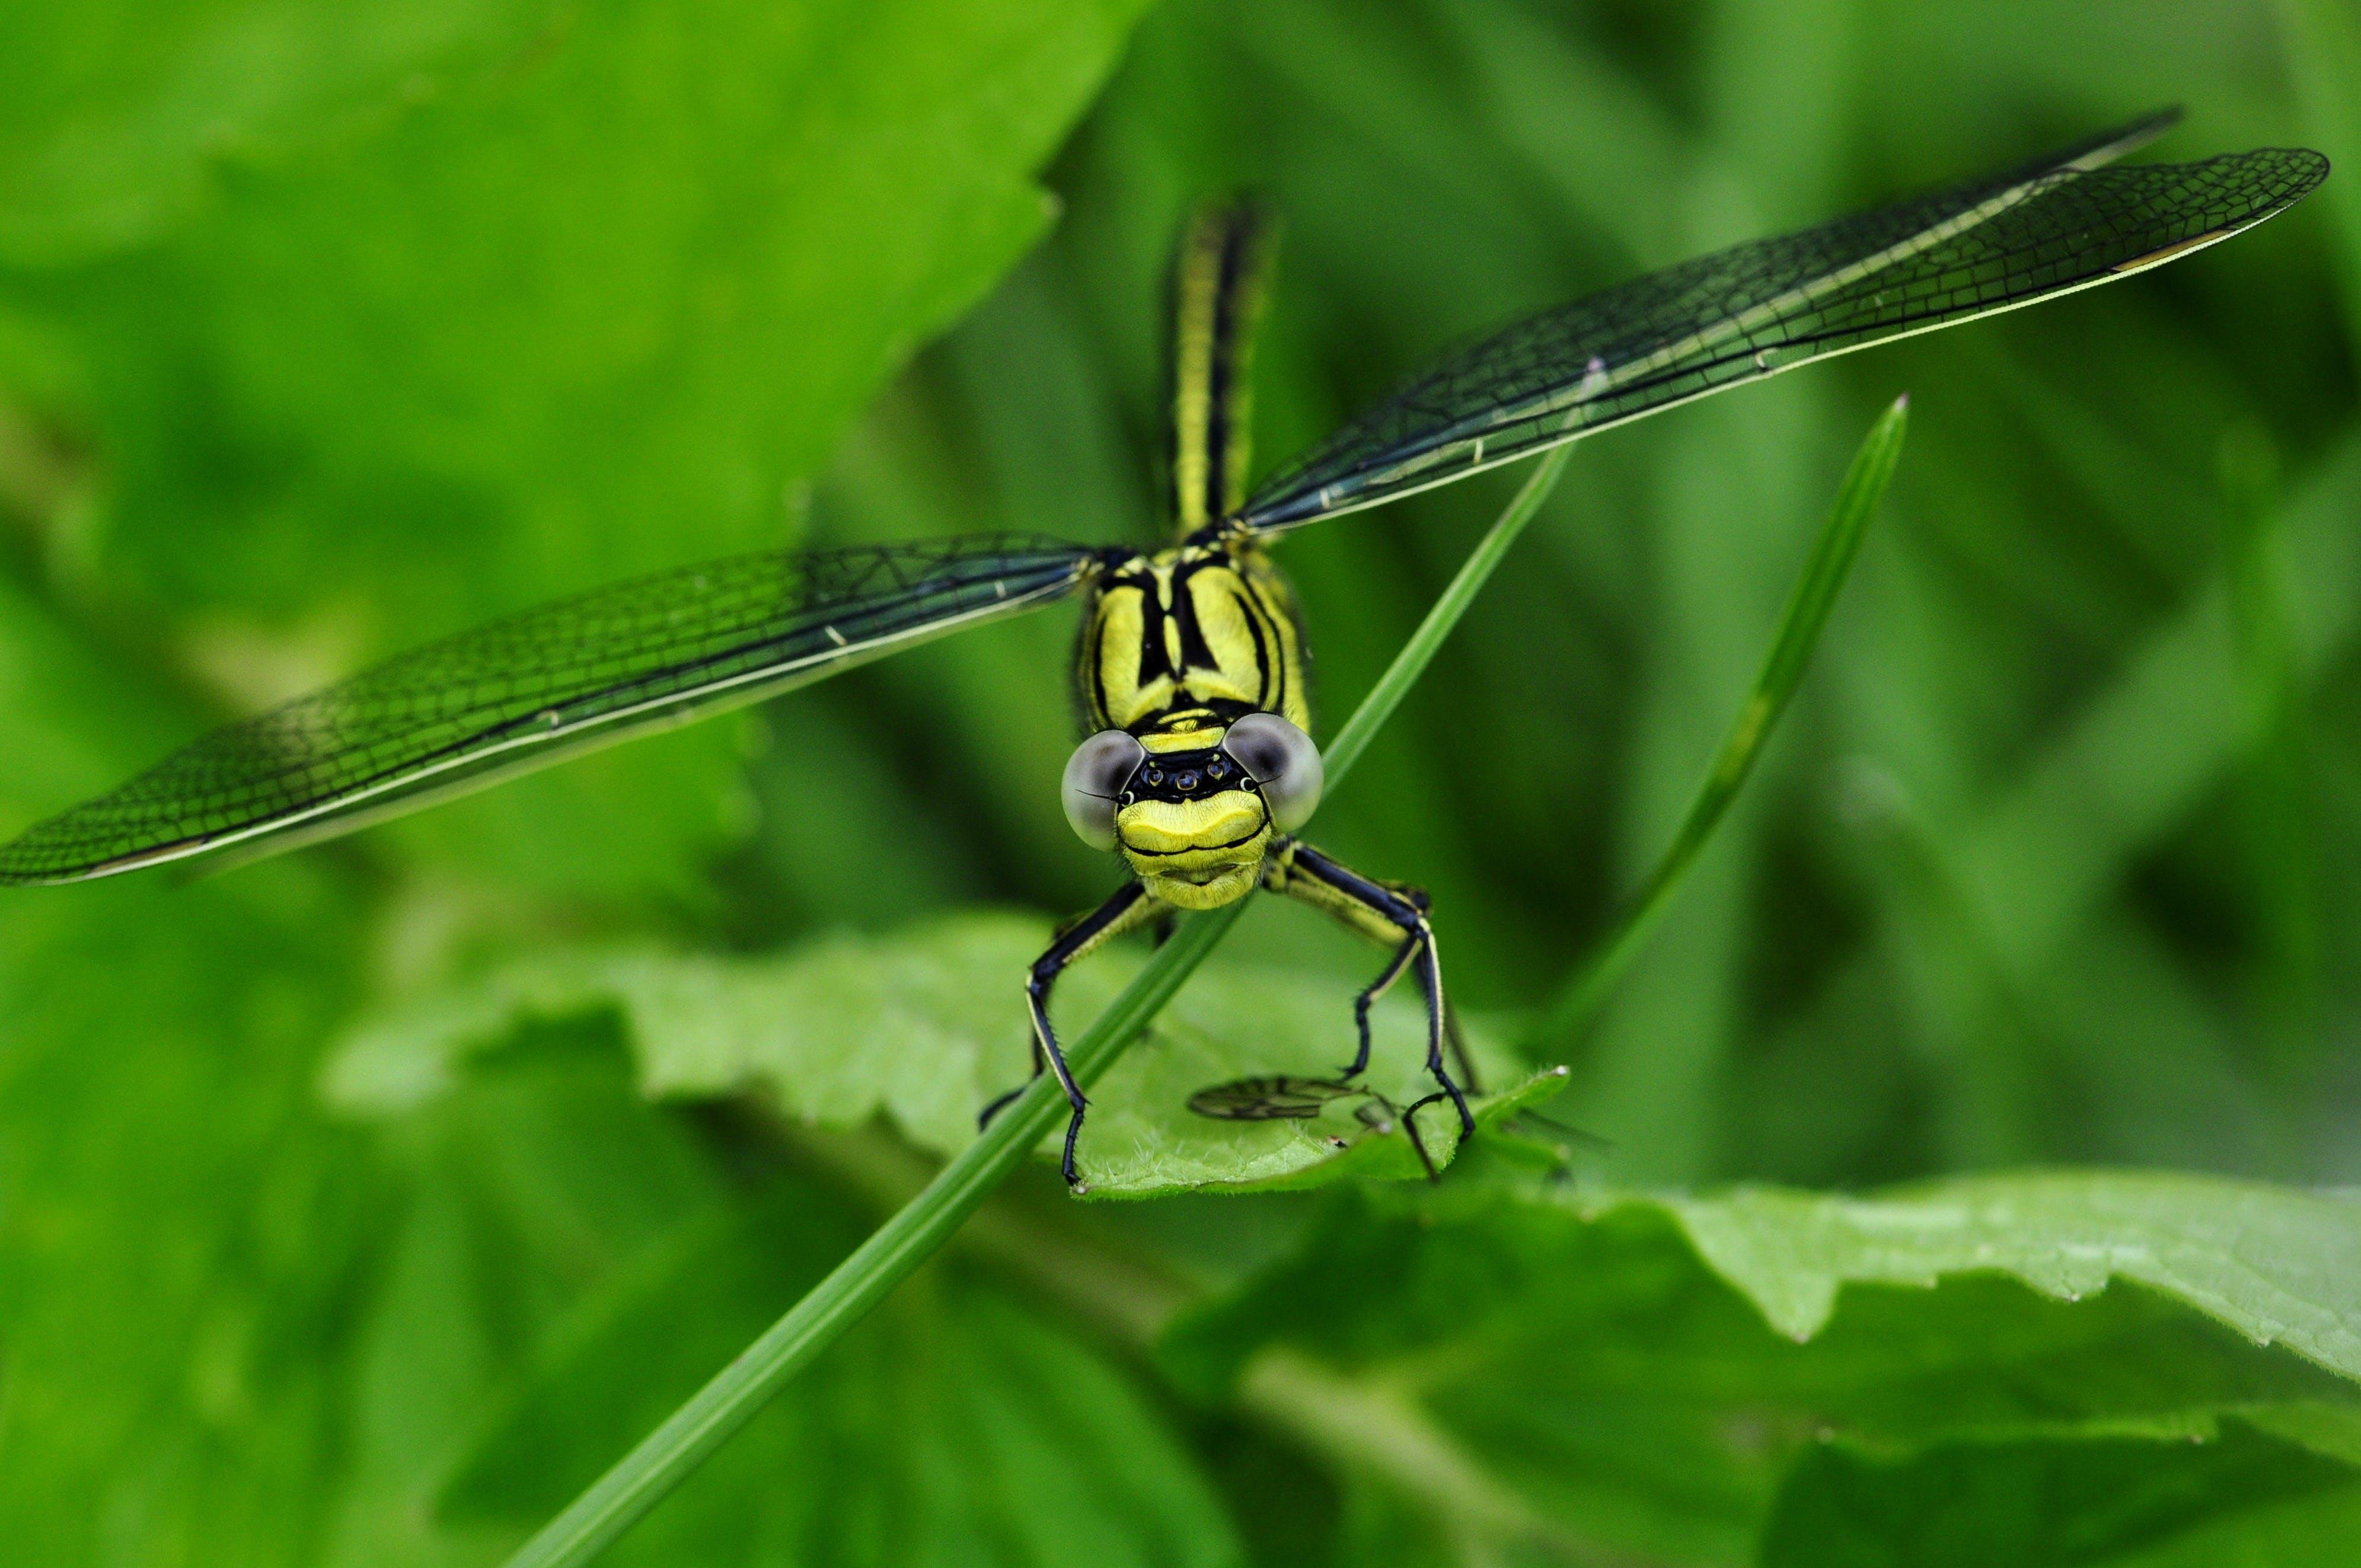 Green Dragon Fly